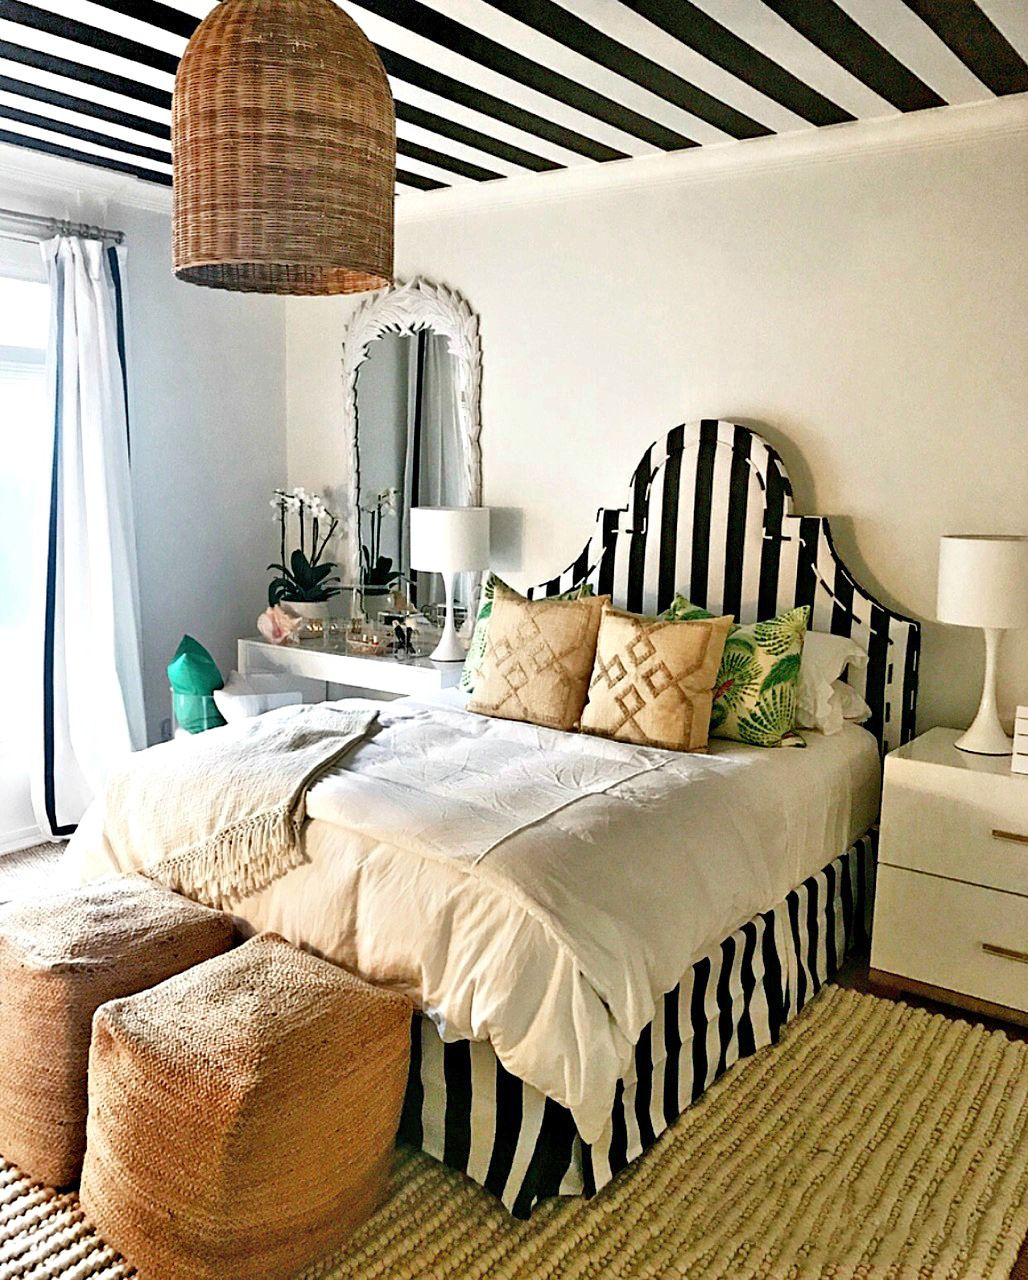 Black & White Striped Ceiling Faux Finish Decorative